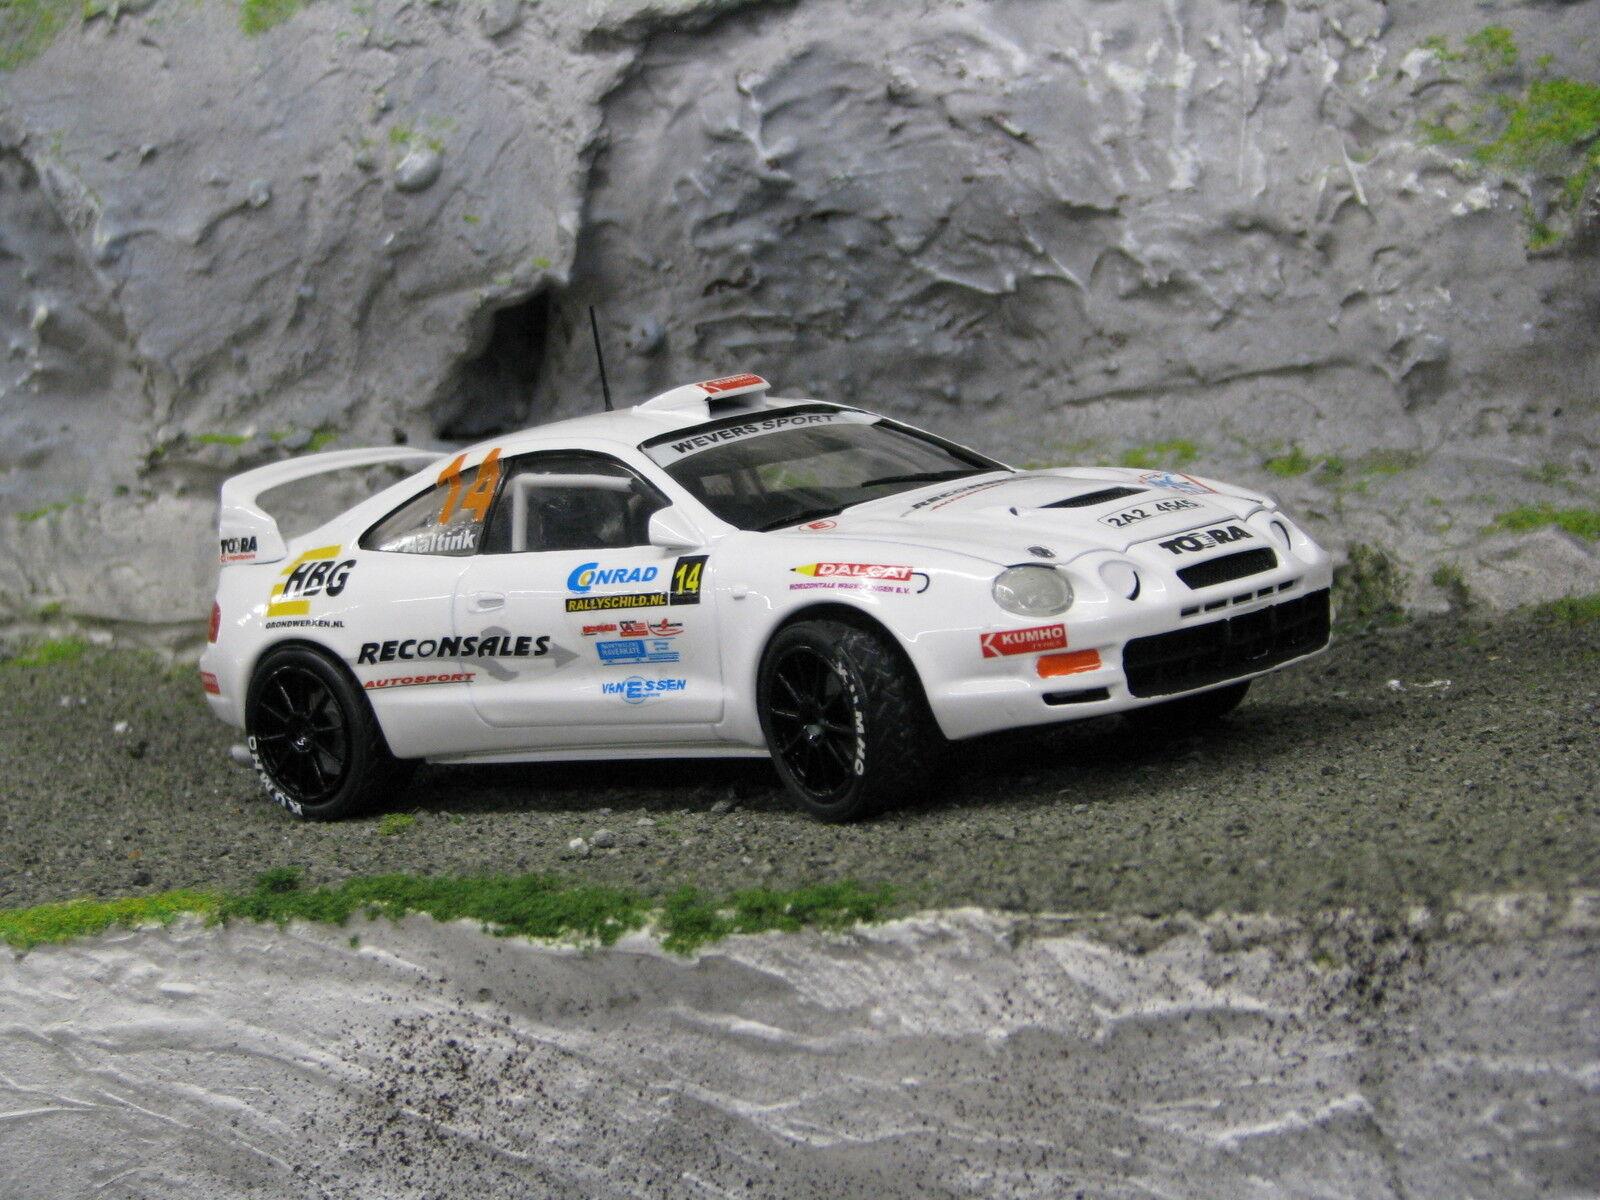 promociones QSP Jugueteota Celica GT-Four GT-Four GT-Four 1 24  14 Nijhof   Aaltink Conrad Euregio Rally 2005  tienda en linea